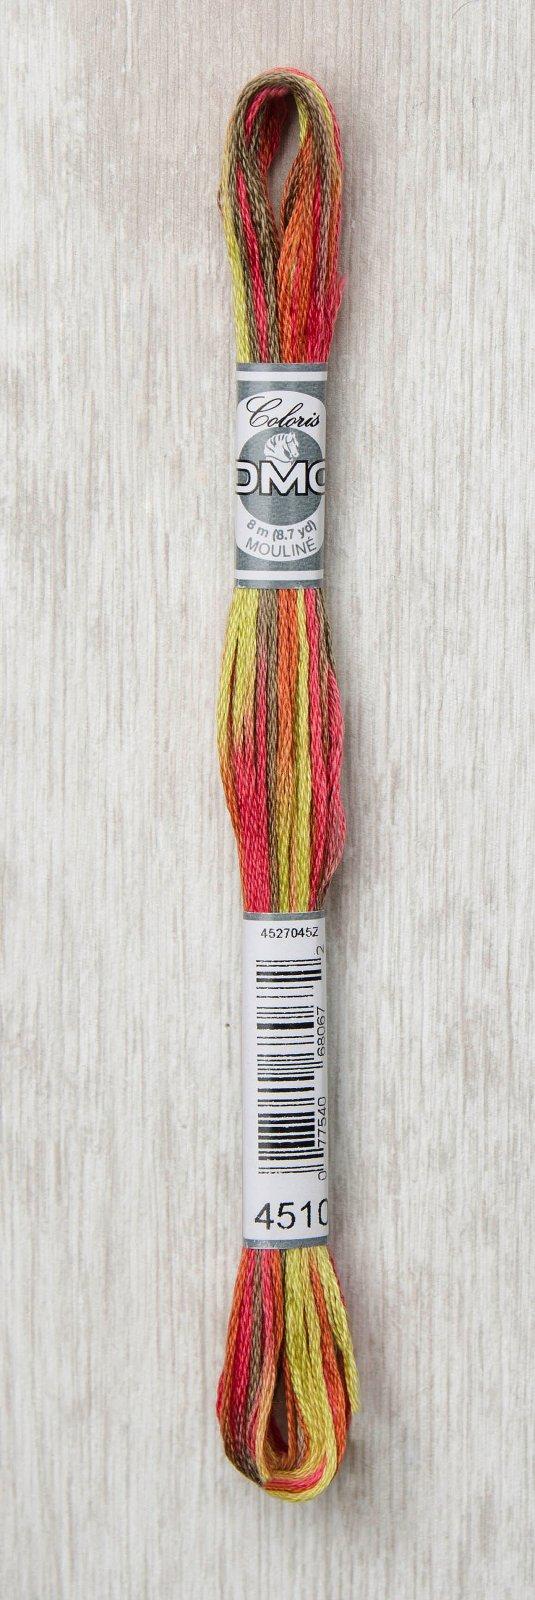 Coloris Embroidery Thread Maple